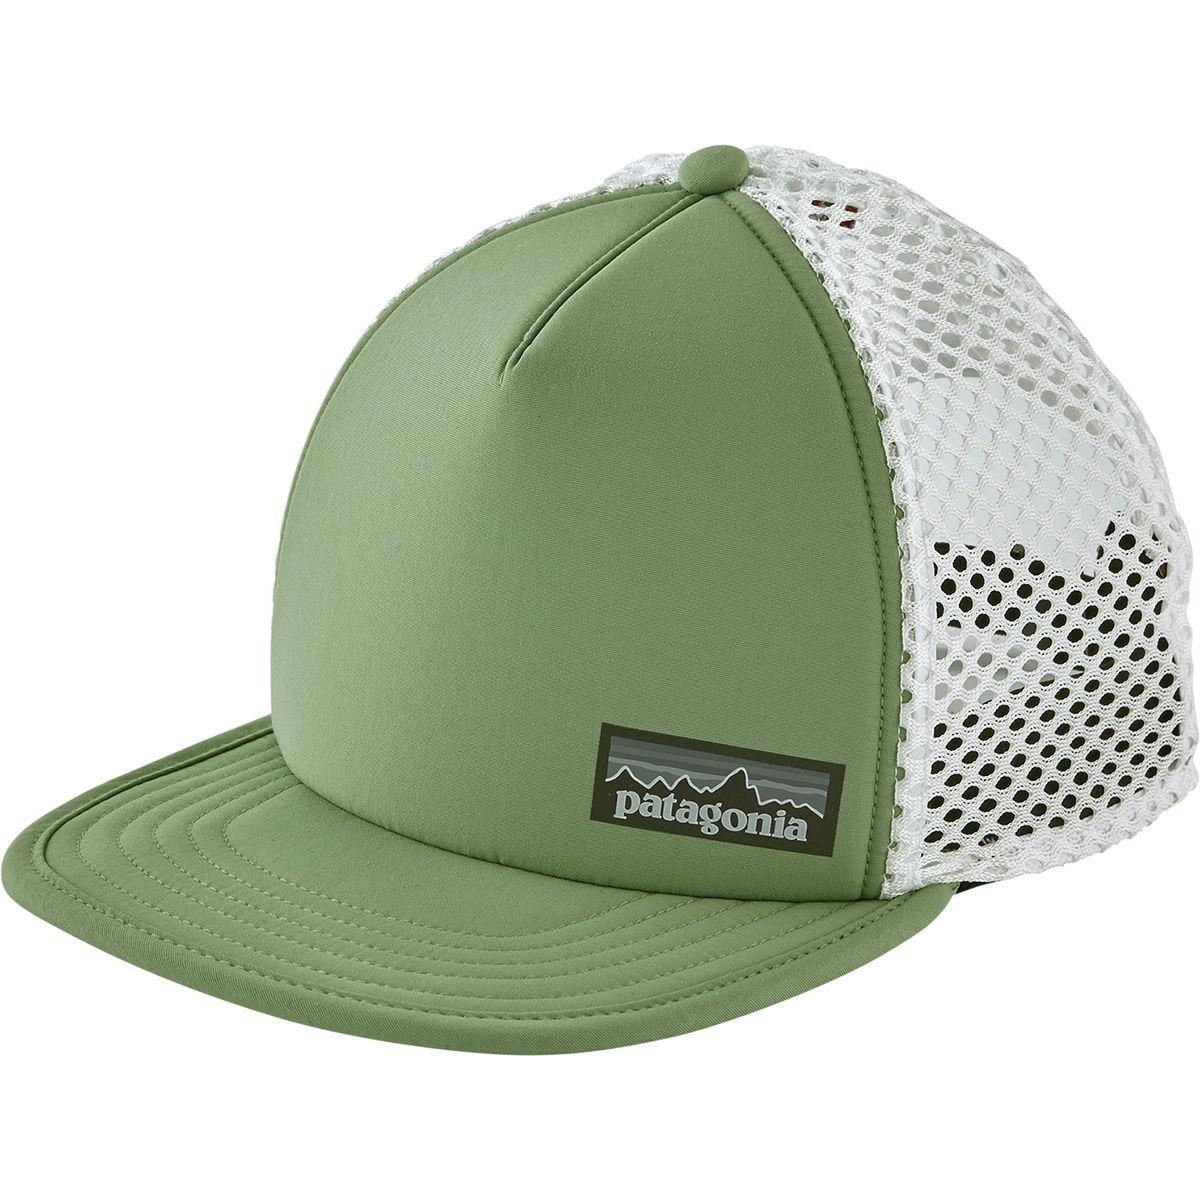 e2c74c4141a03 Lyst - Patagonia Duckbill Trucker Hat in Green for Men